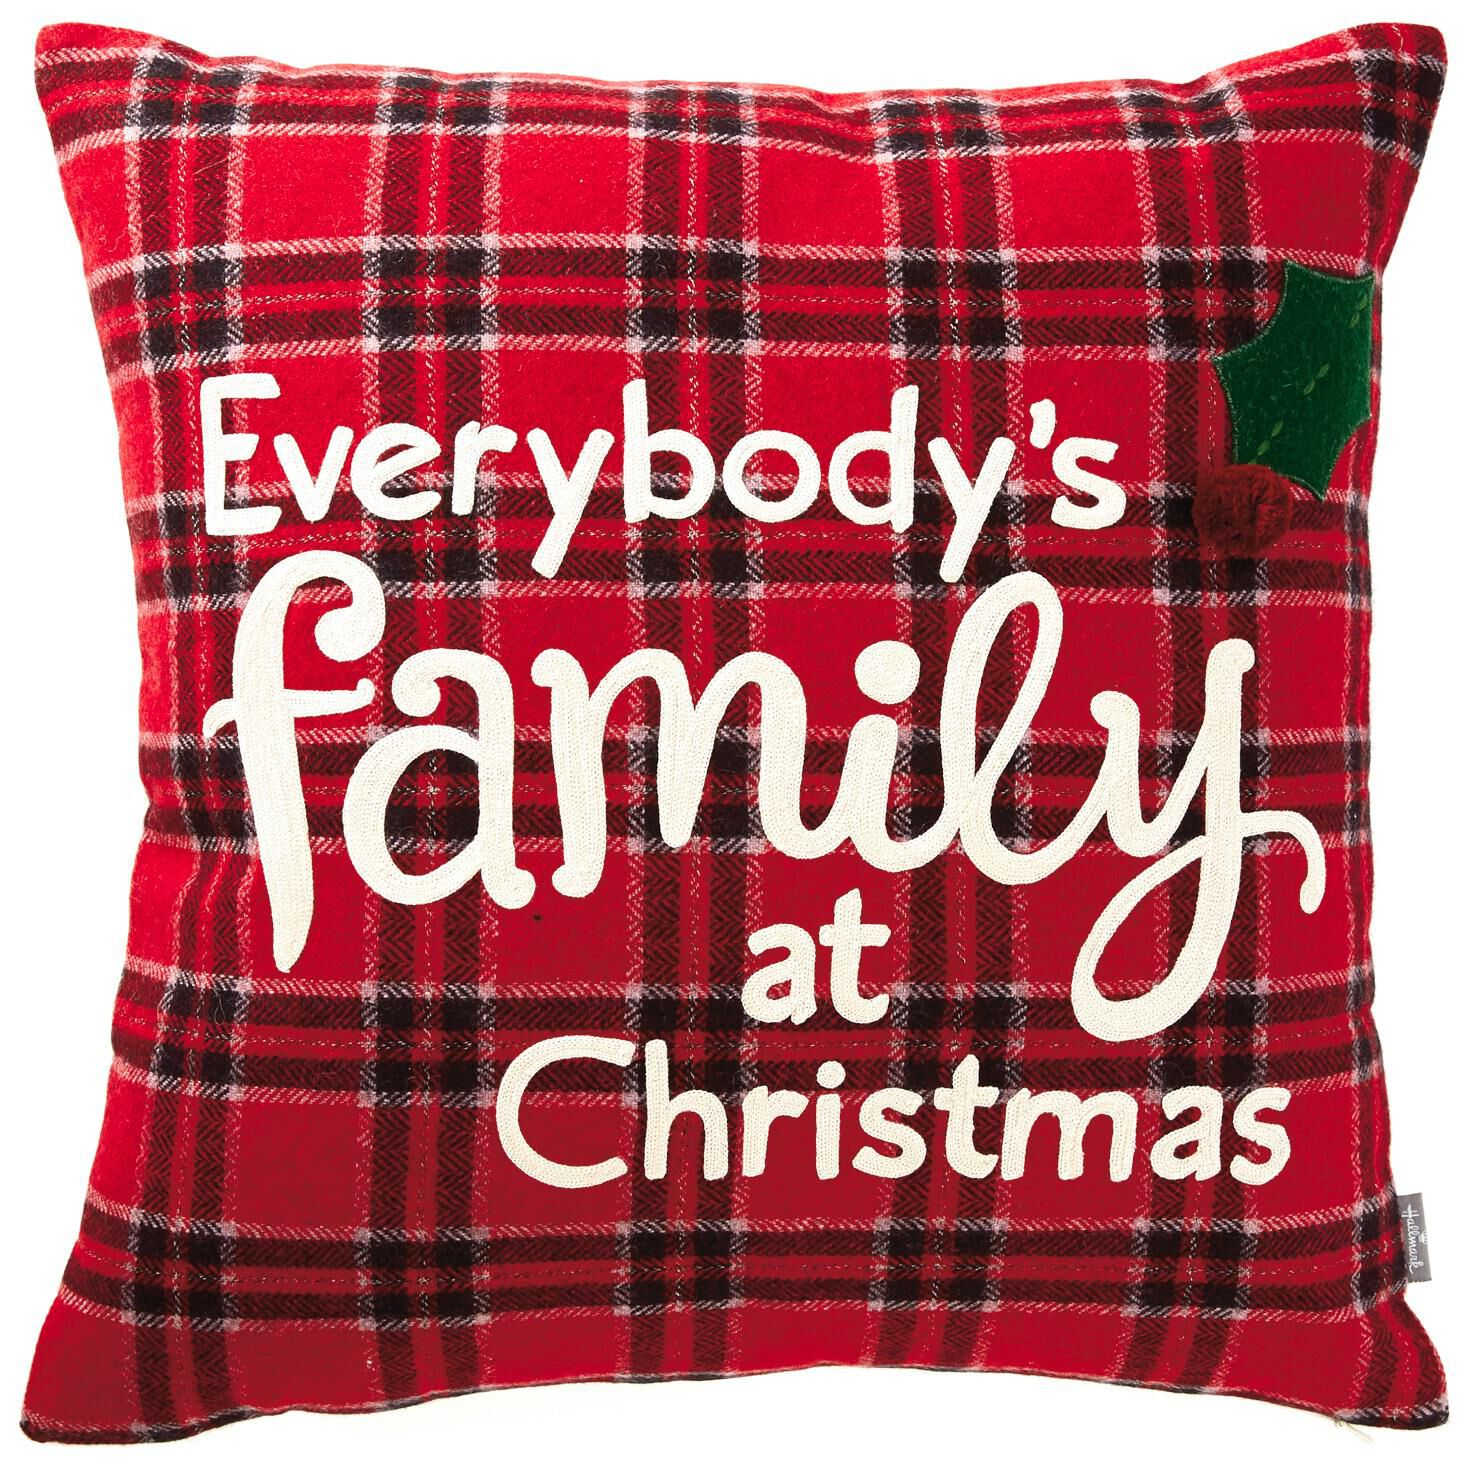 "Family at Christmas Throw Pillow, 19"" - Pillows"